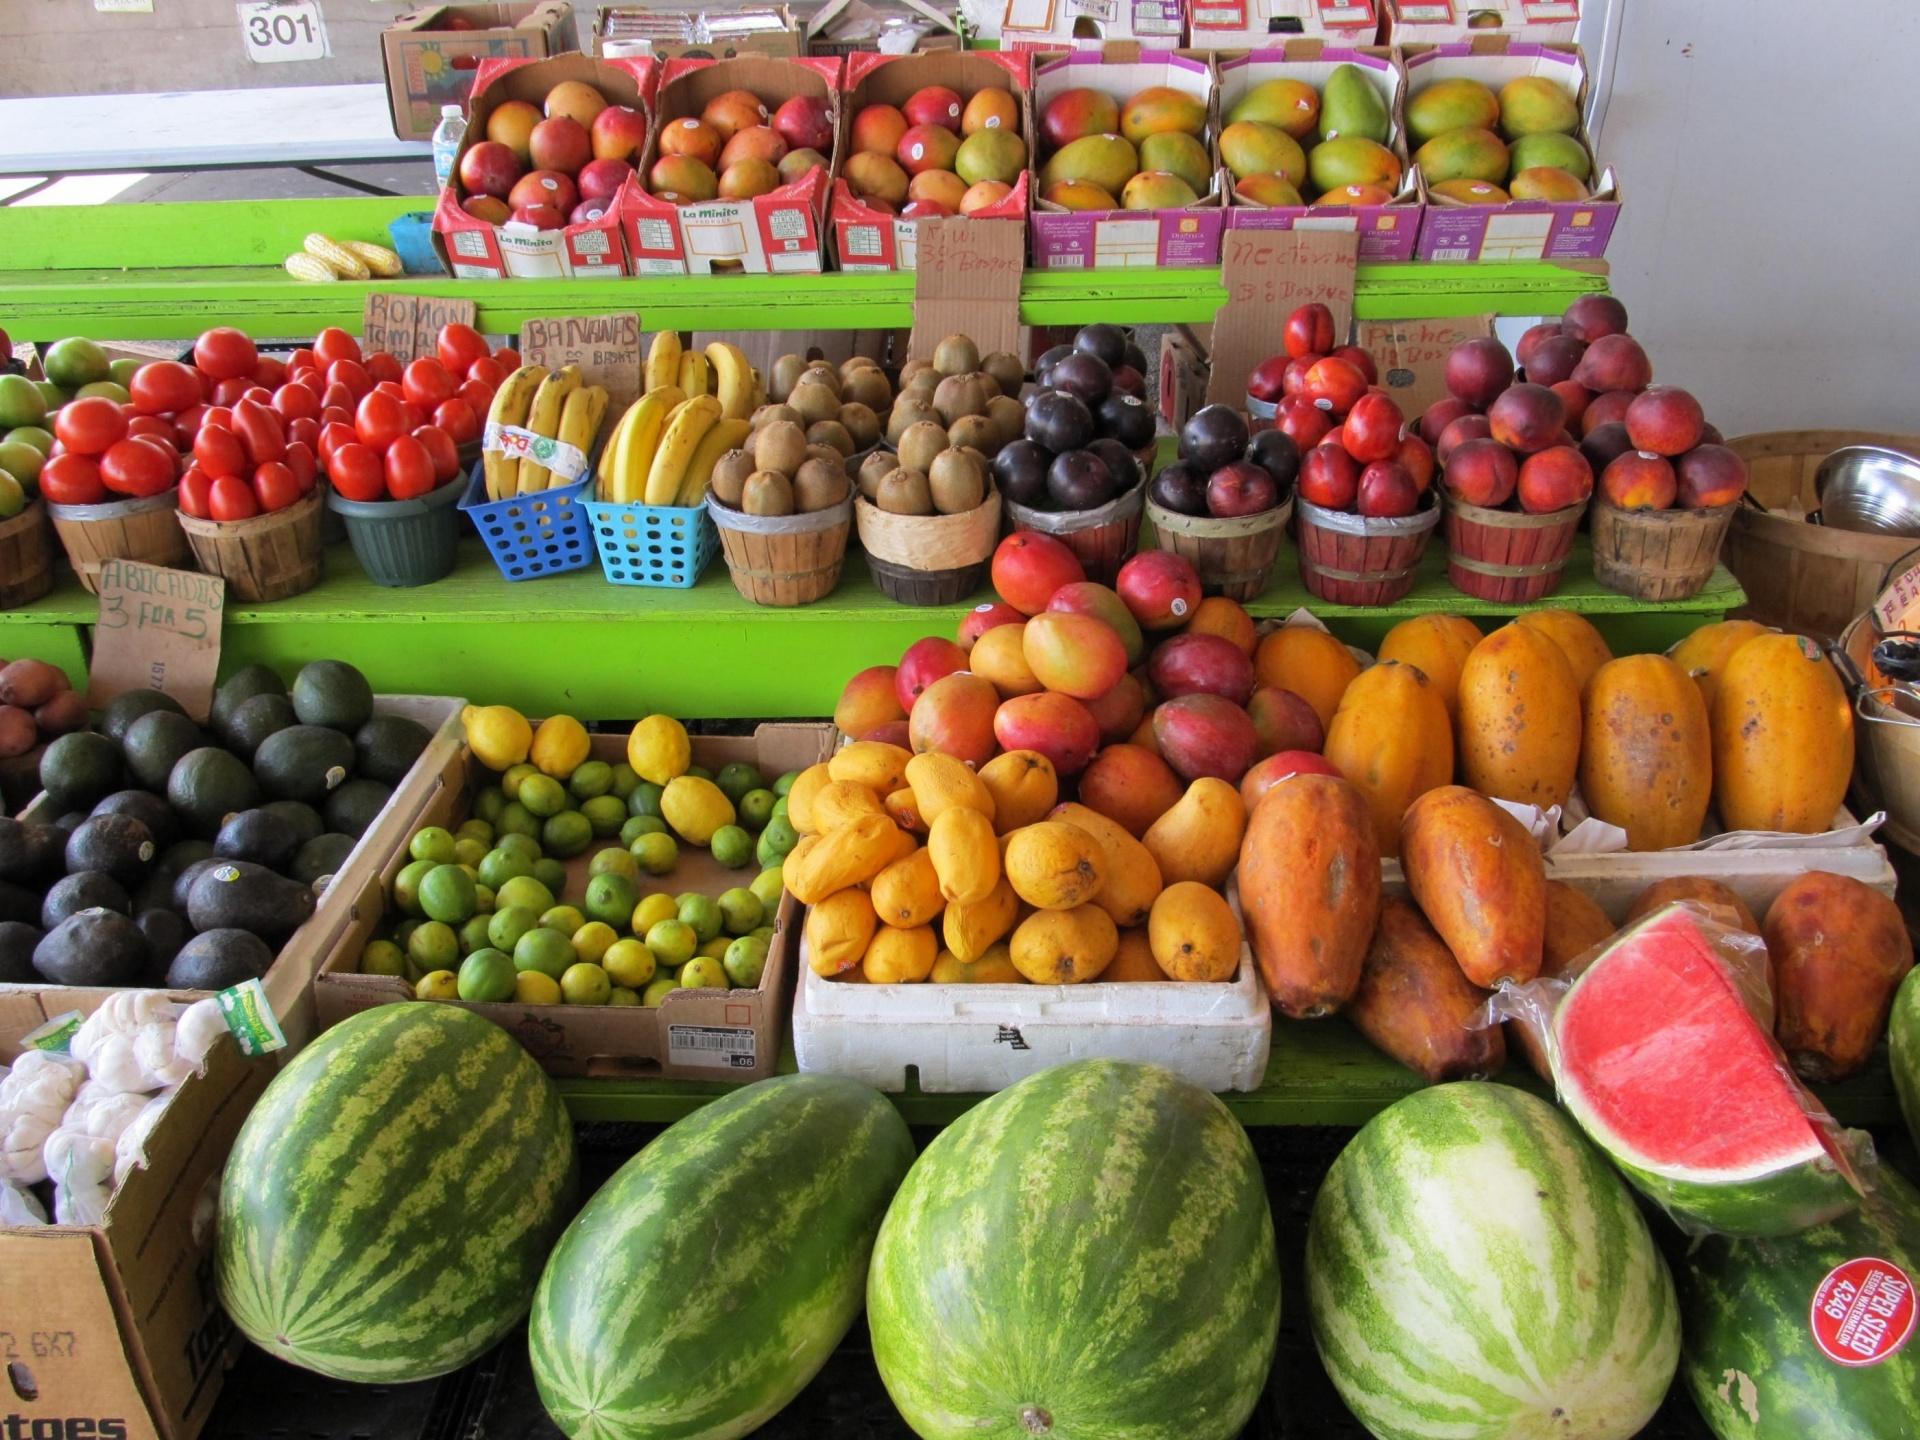 Food Pantries More Than Just Food